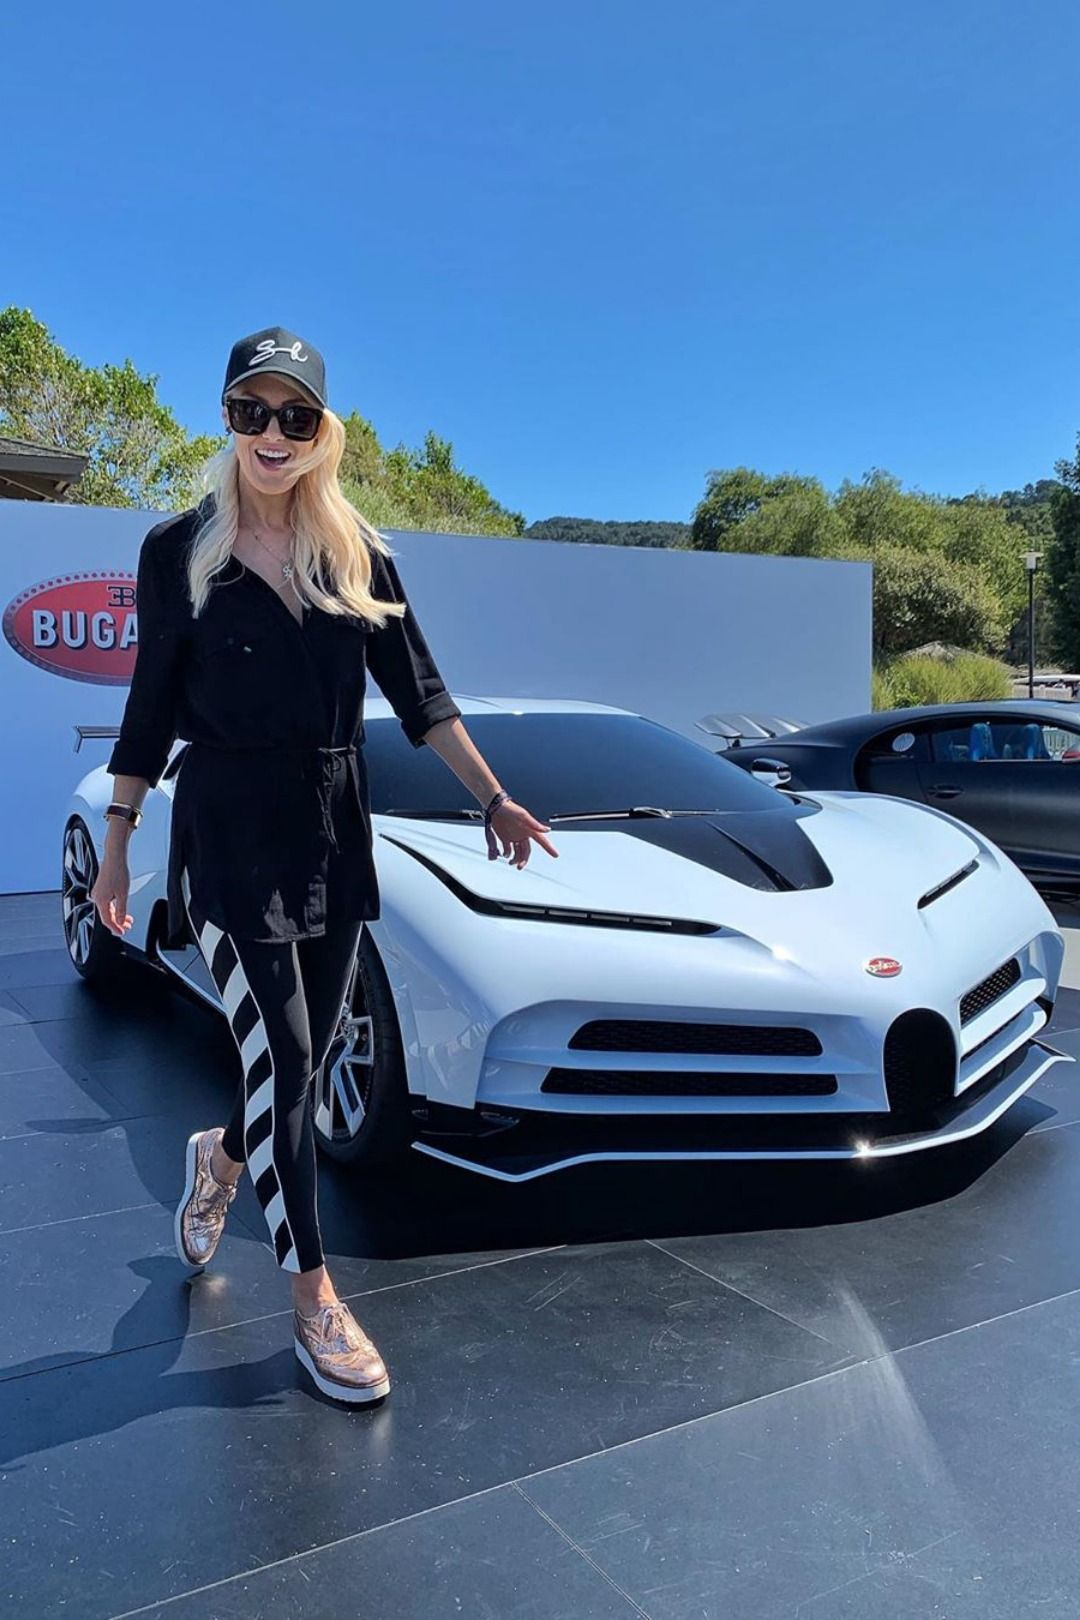 Health Insurance Brokers For Small Business Bugatti Super Cars Amazing Cars